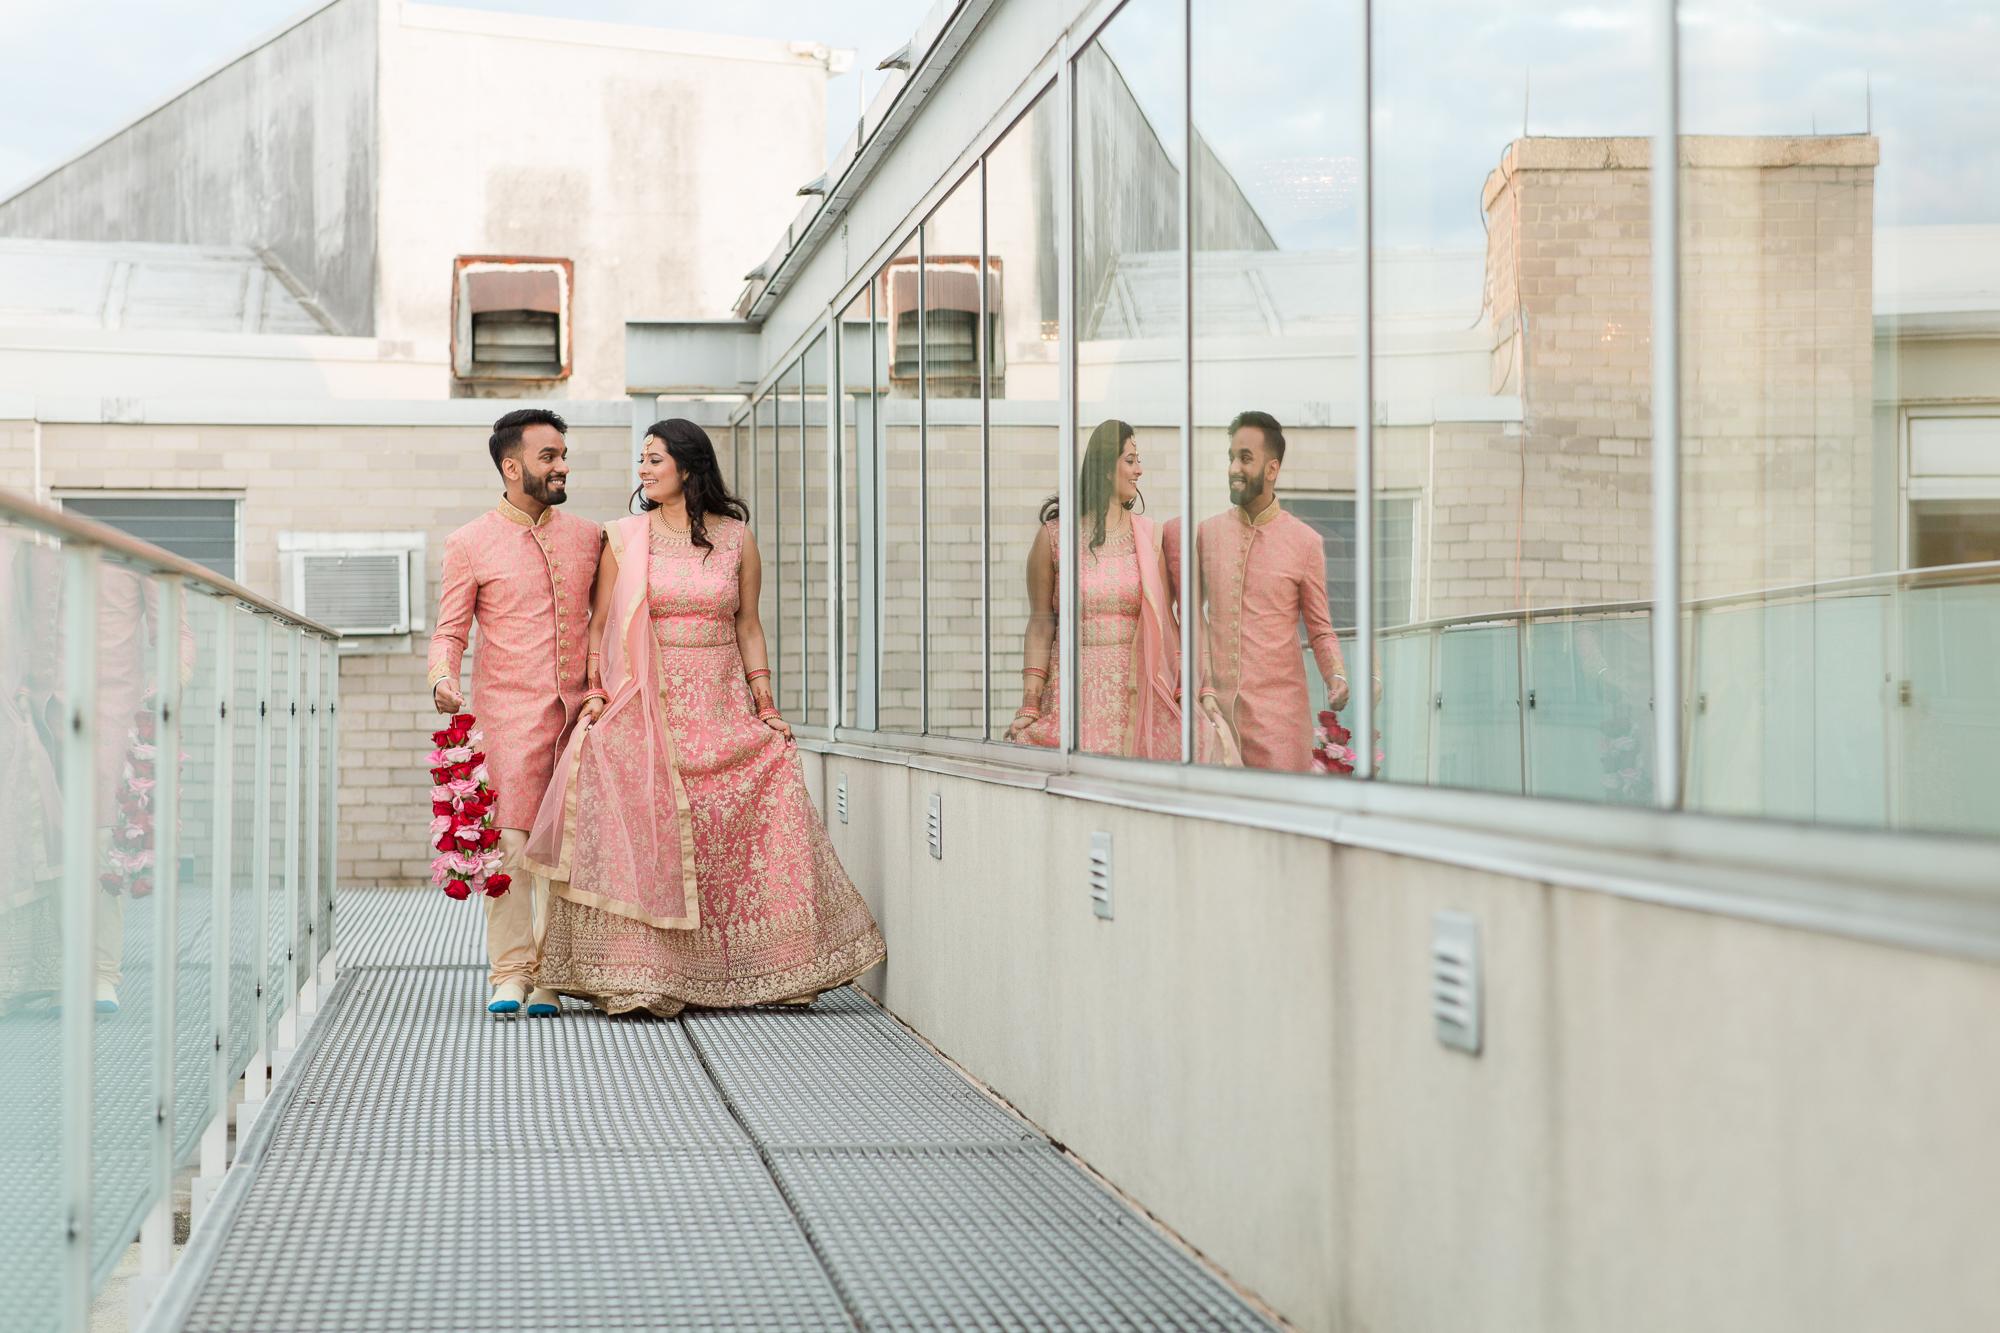 anumeet and gopika, indian engagement ring ceremony, top of the town, alexandria, northern virginia, nova weddings-72.jpg